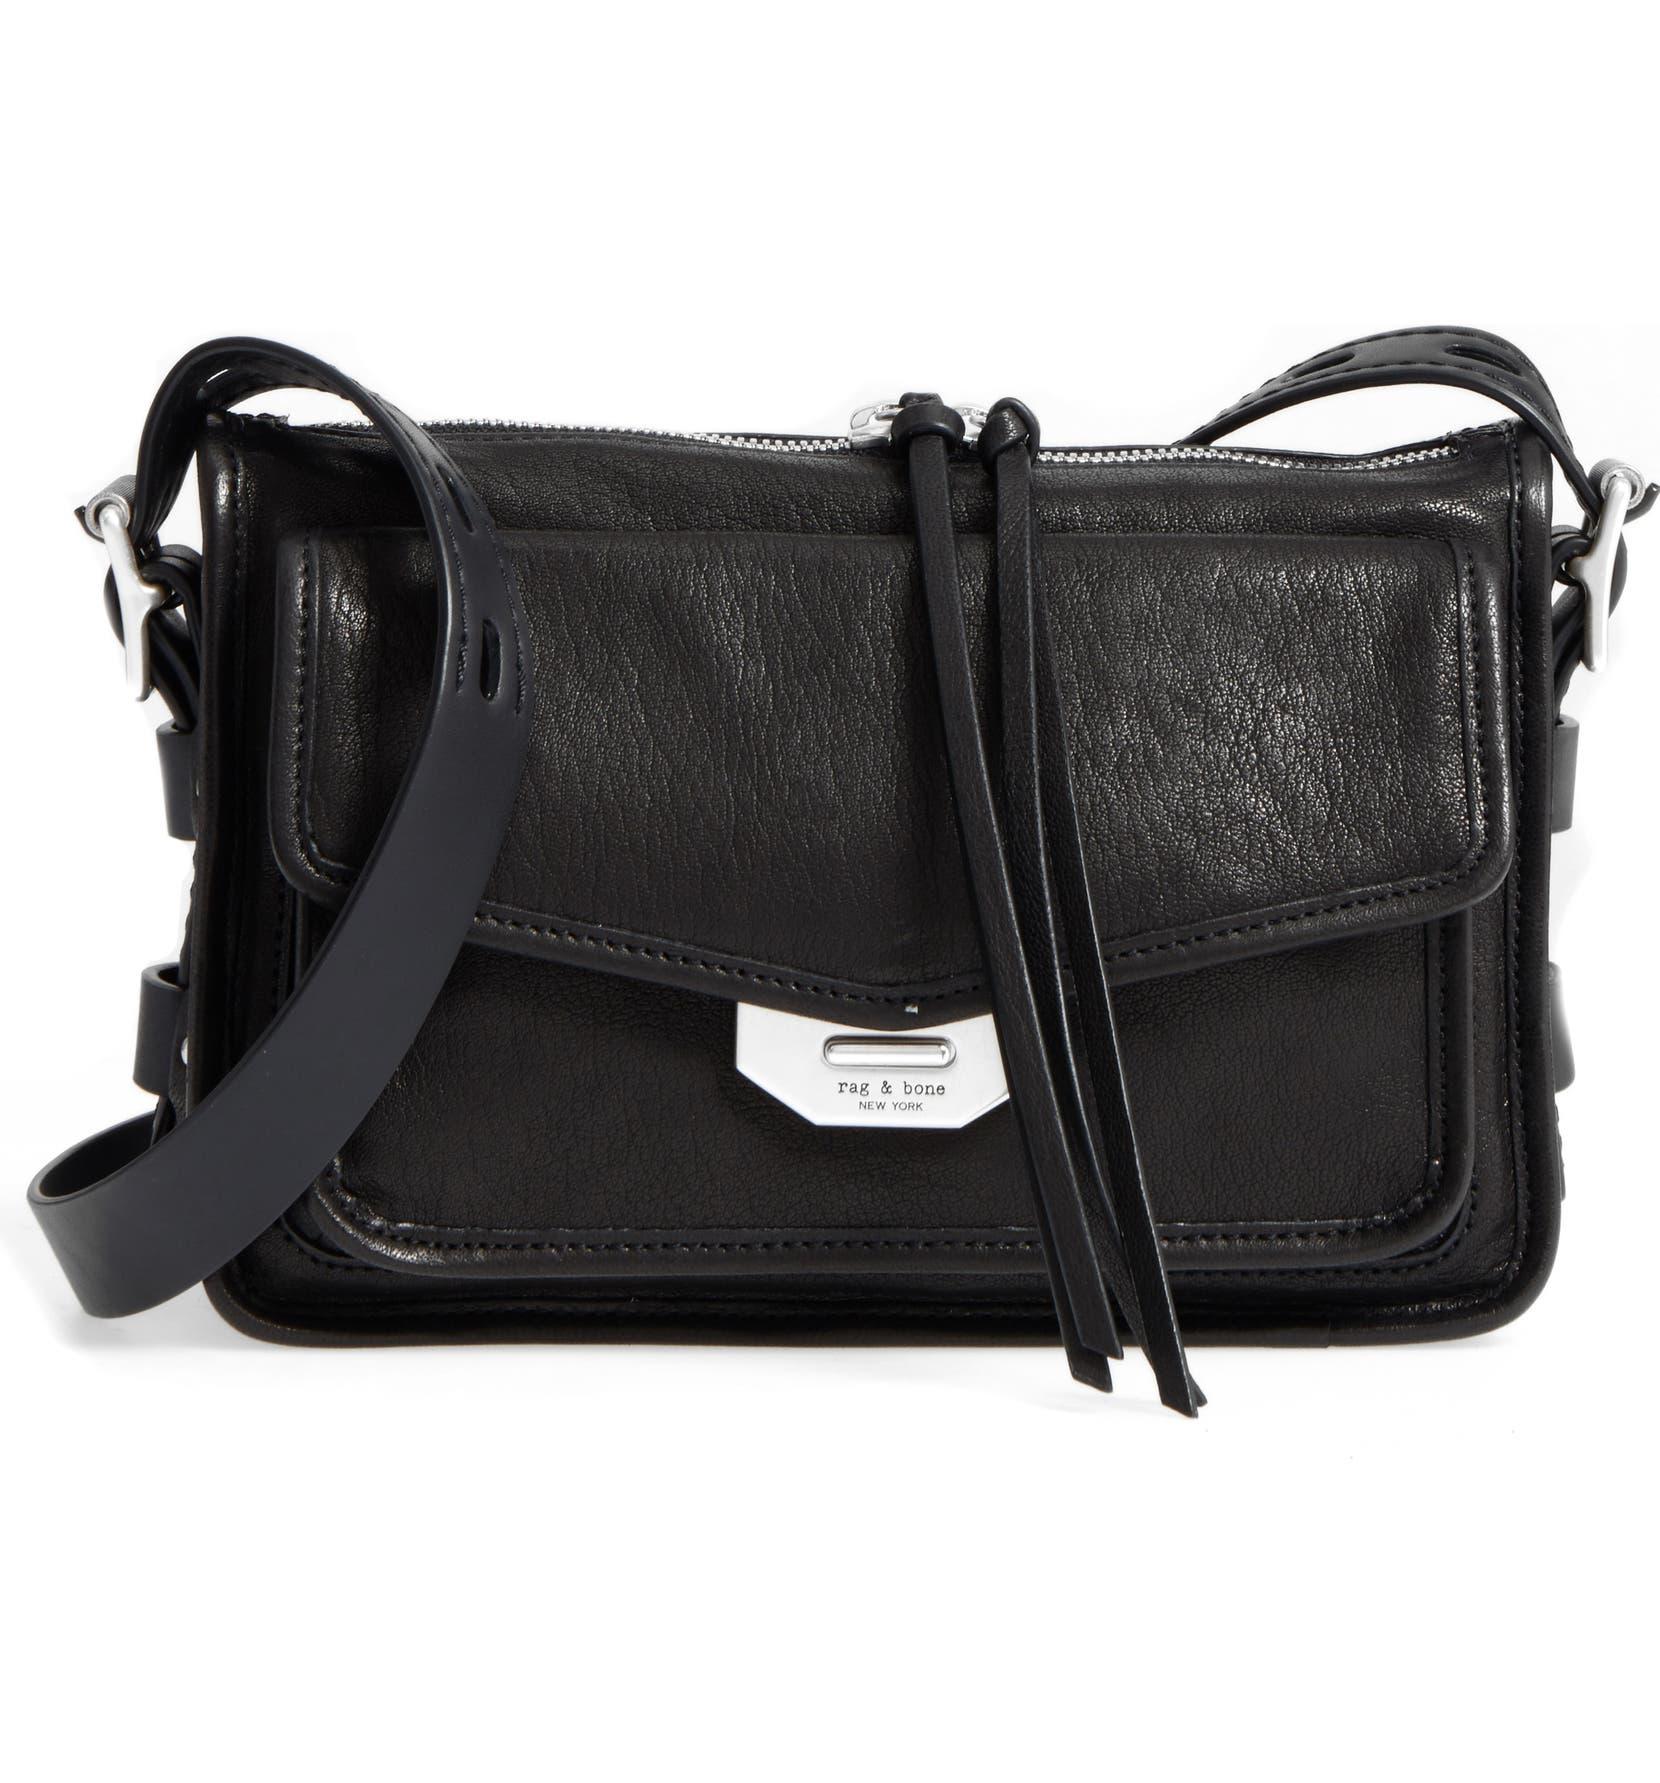 068549ea0912 Small Field Leather Messenger Bag